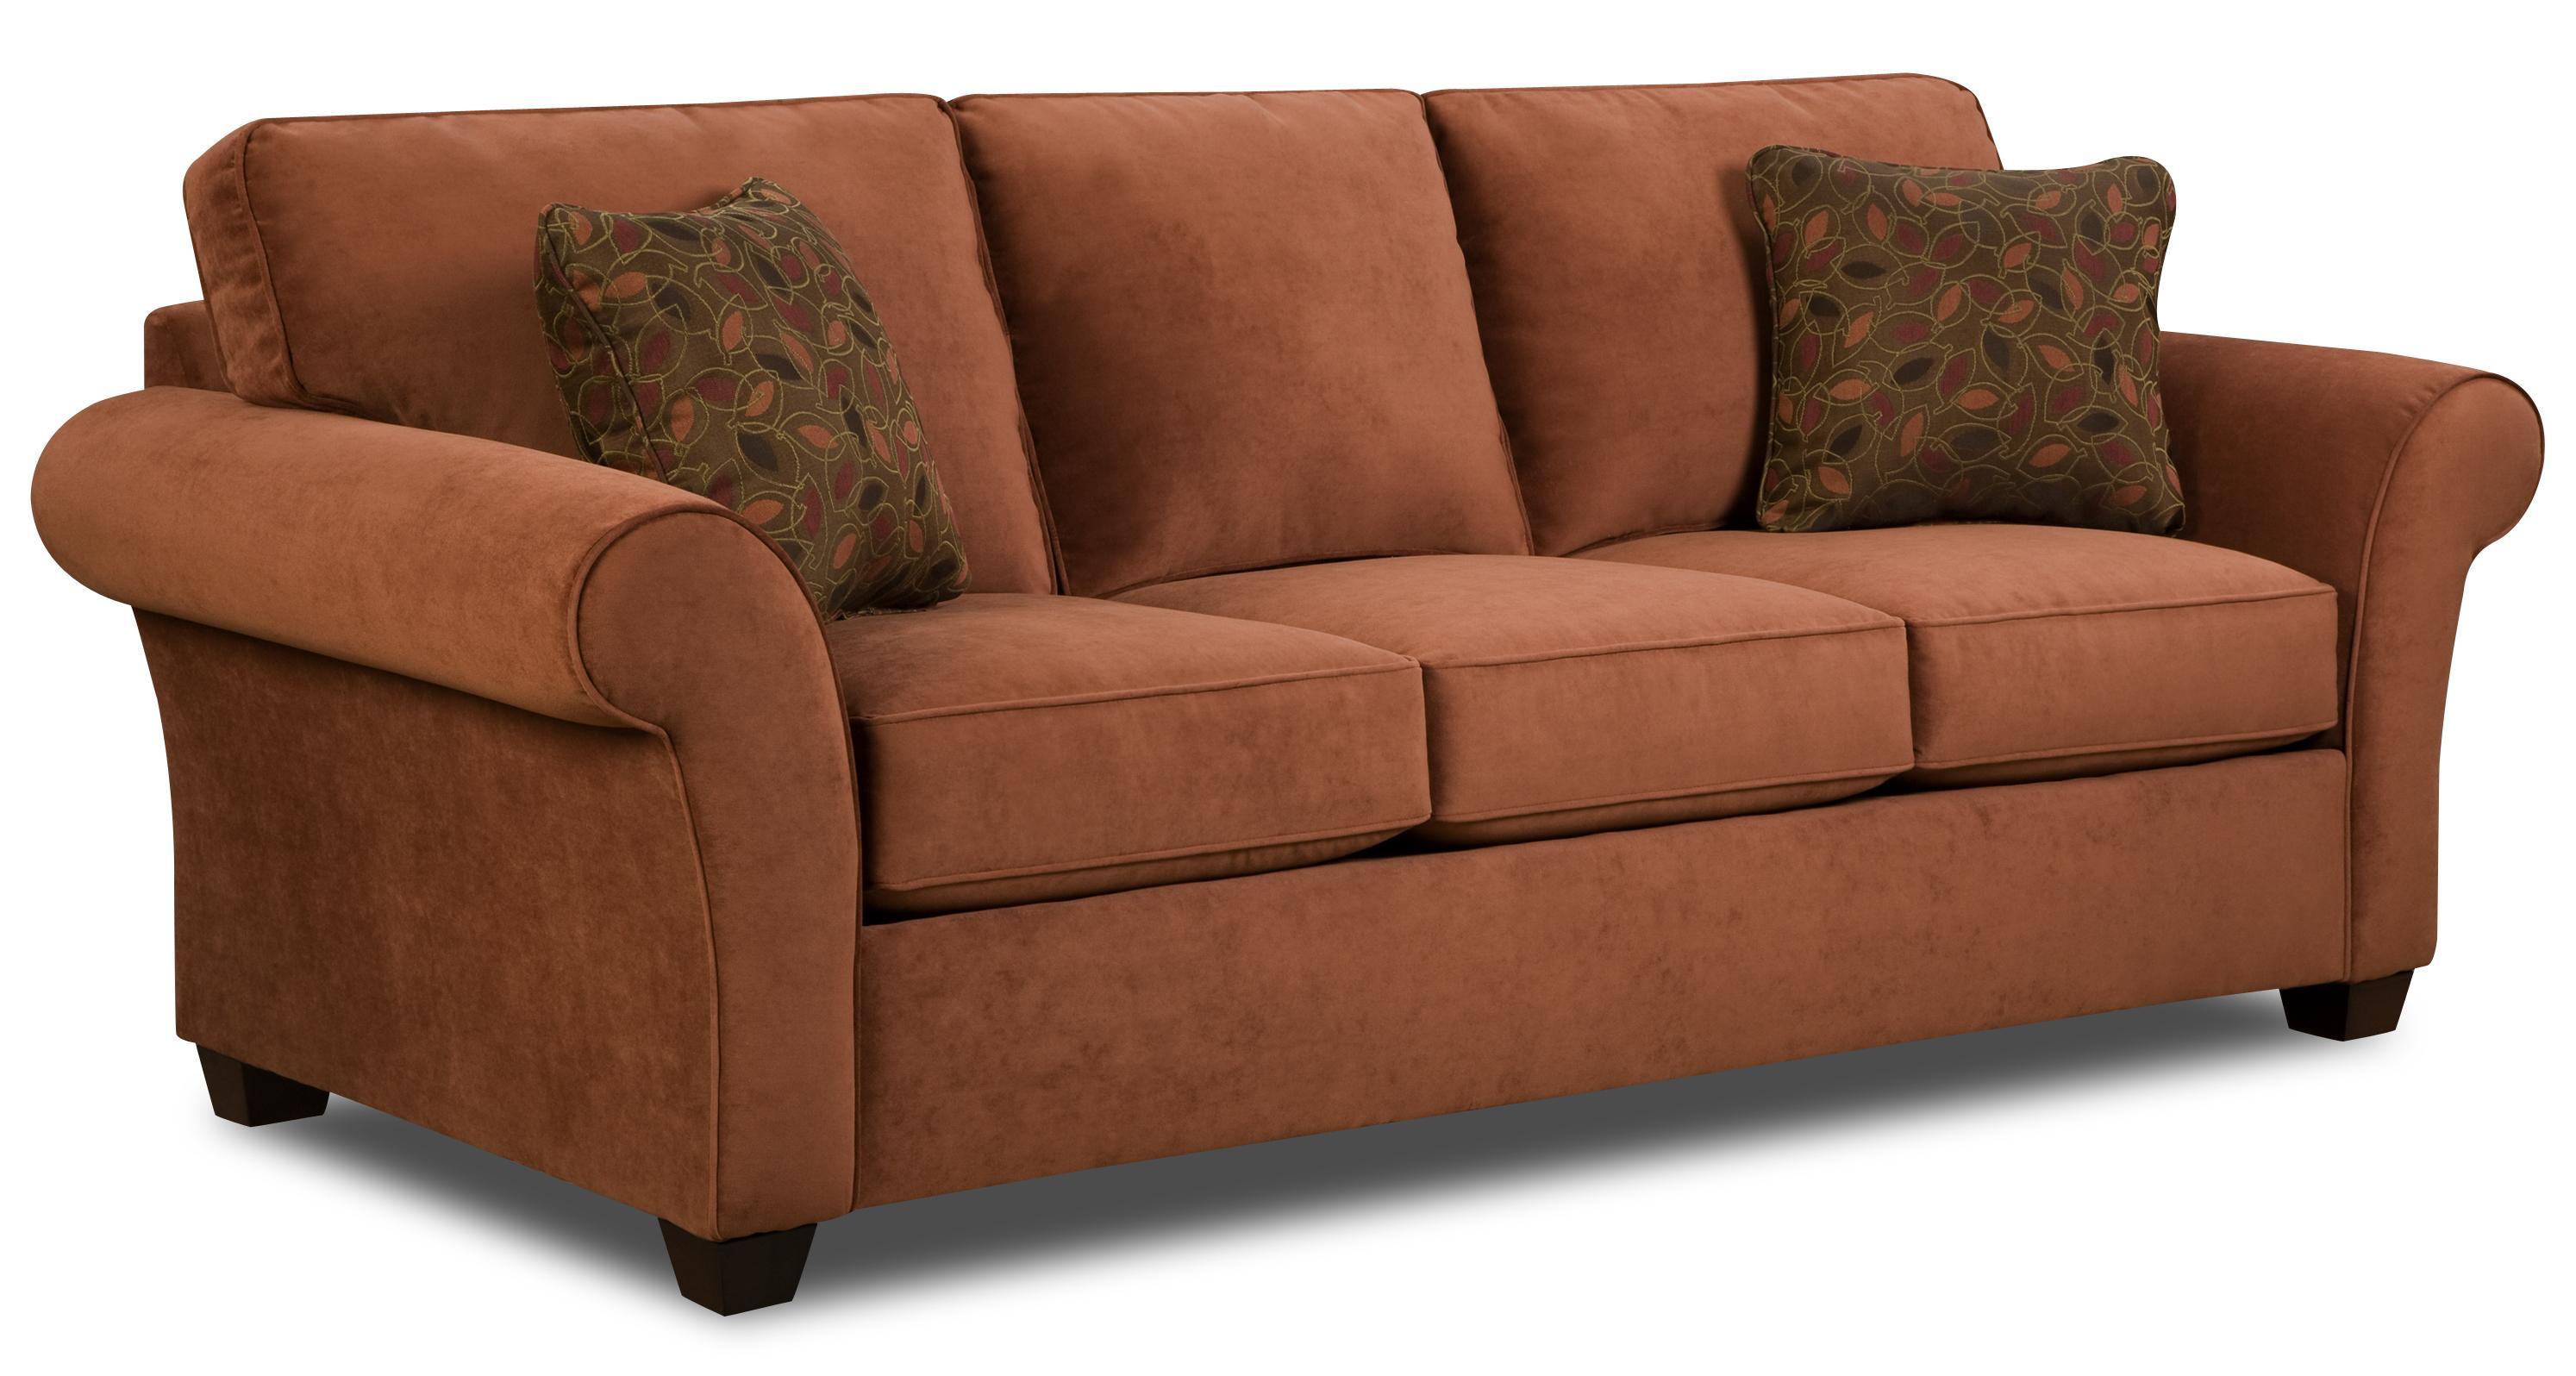 Delightful Bauhaus Z01KStationary Sofa